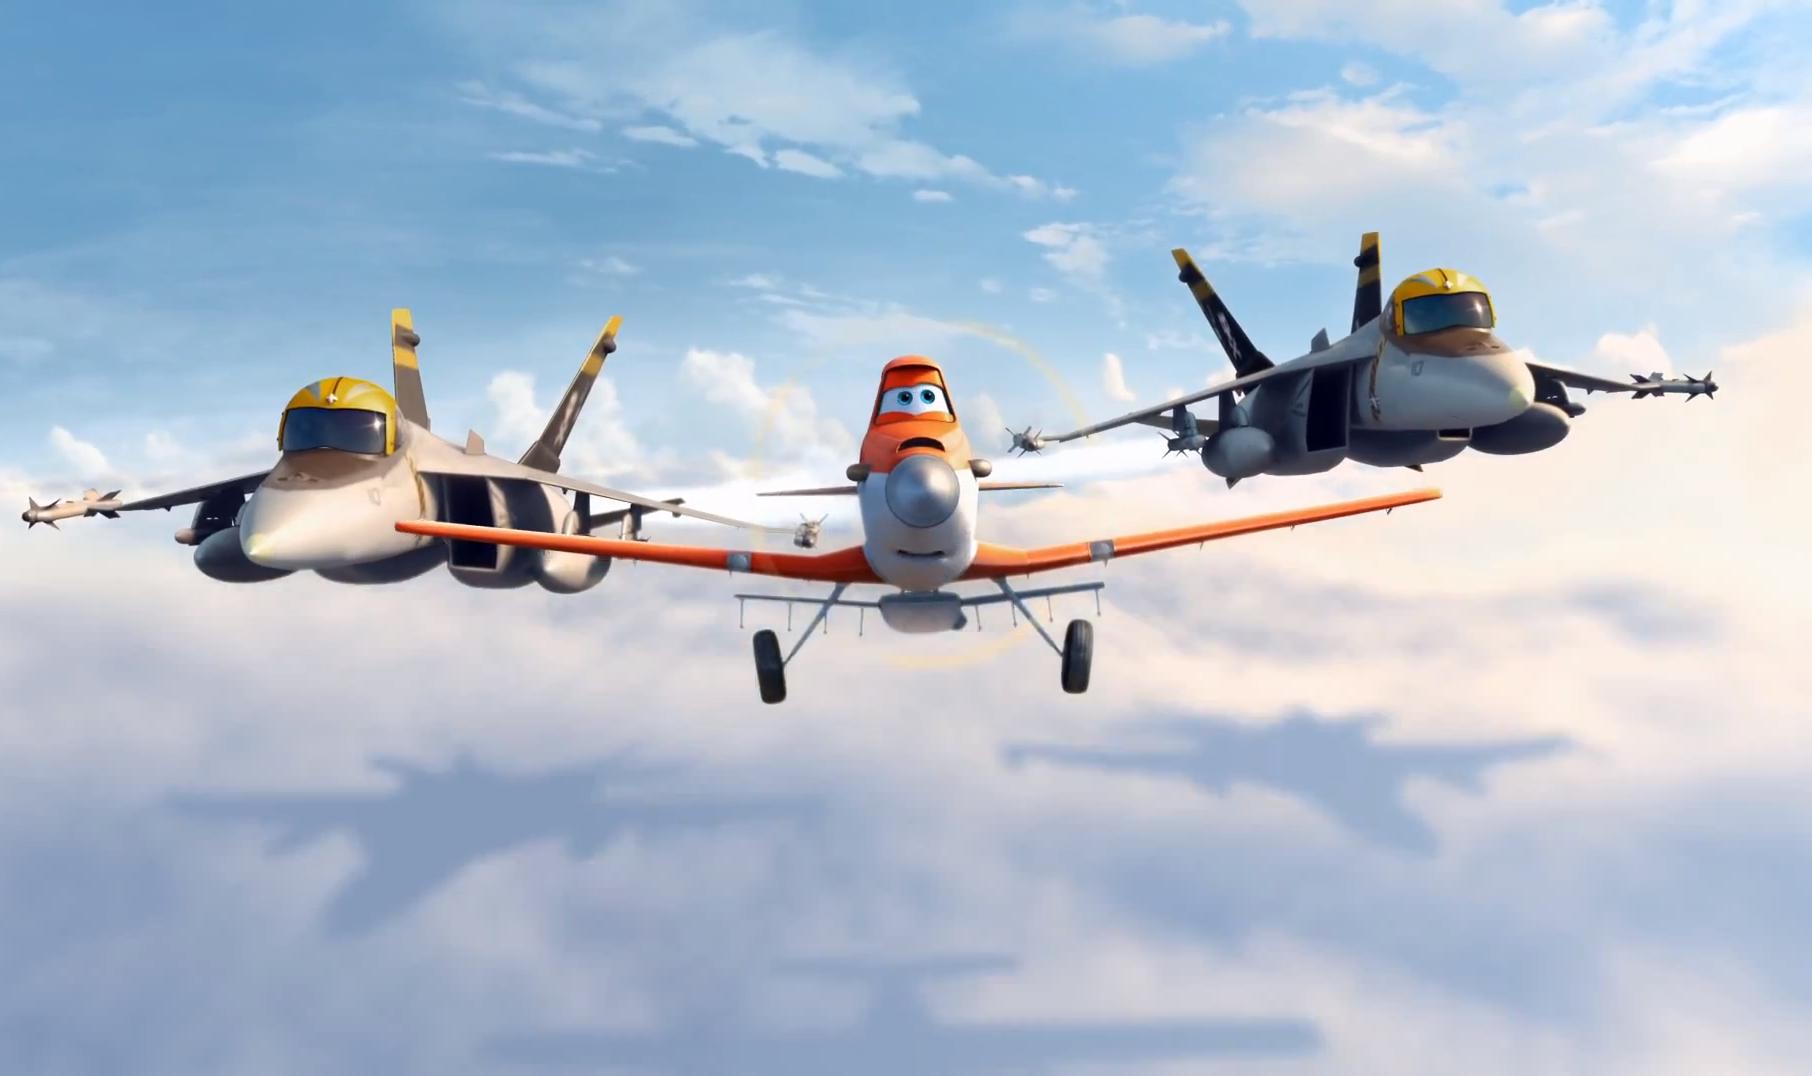 Planes (Walt Disney Studios)